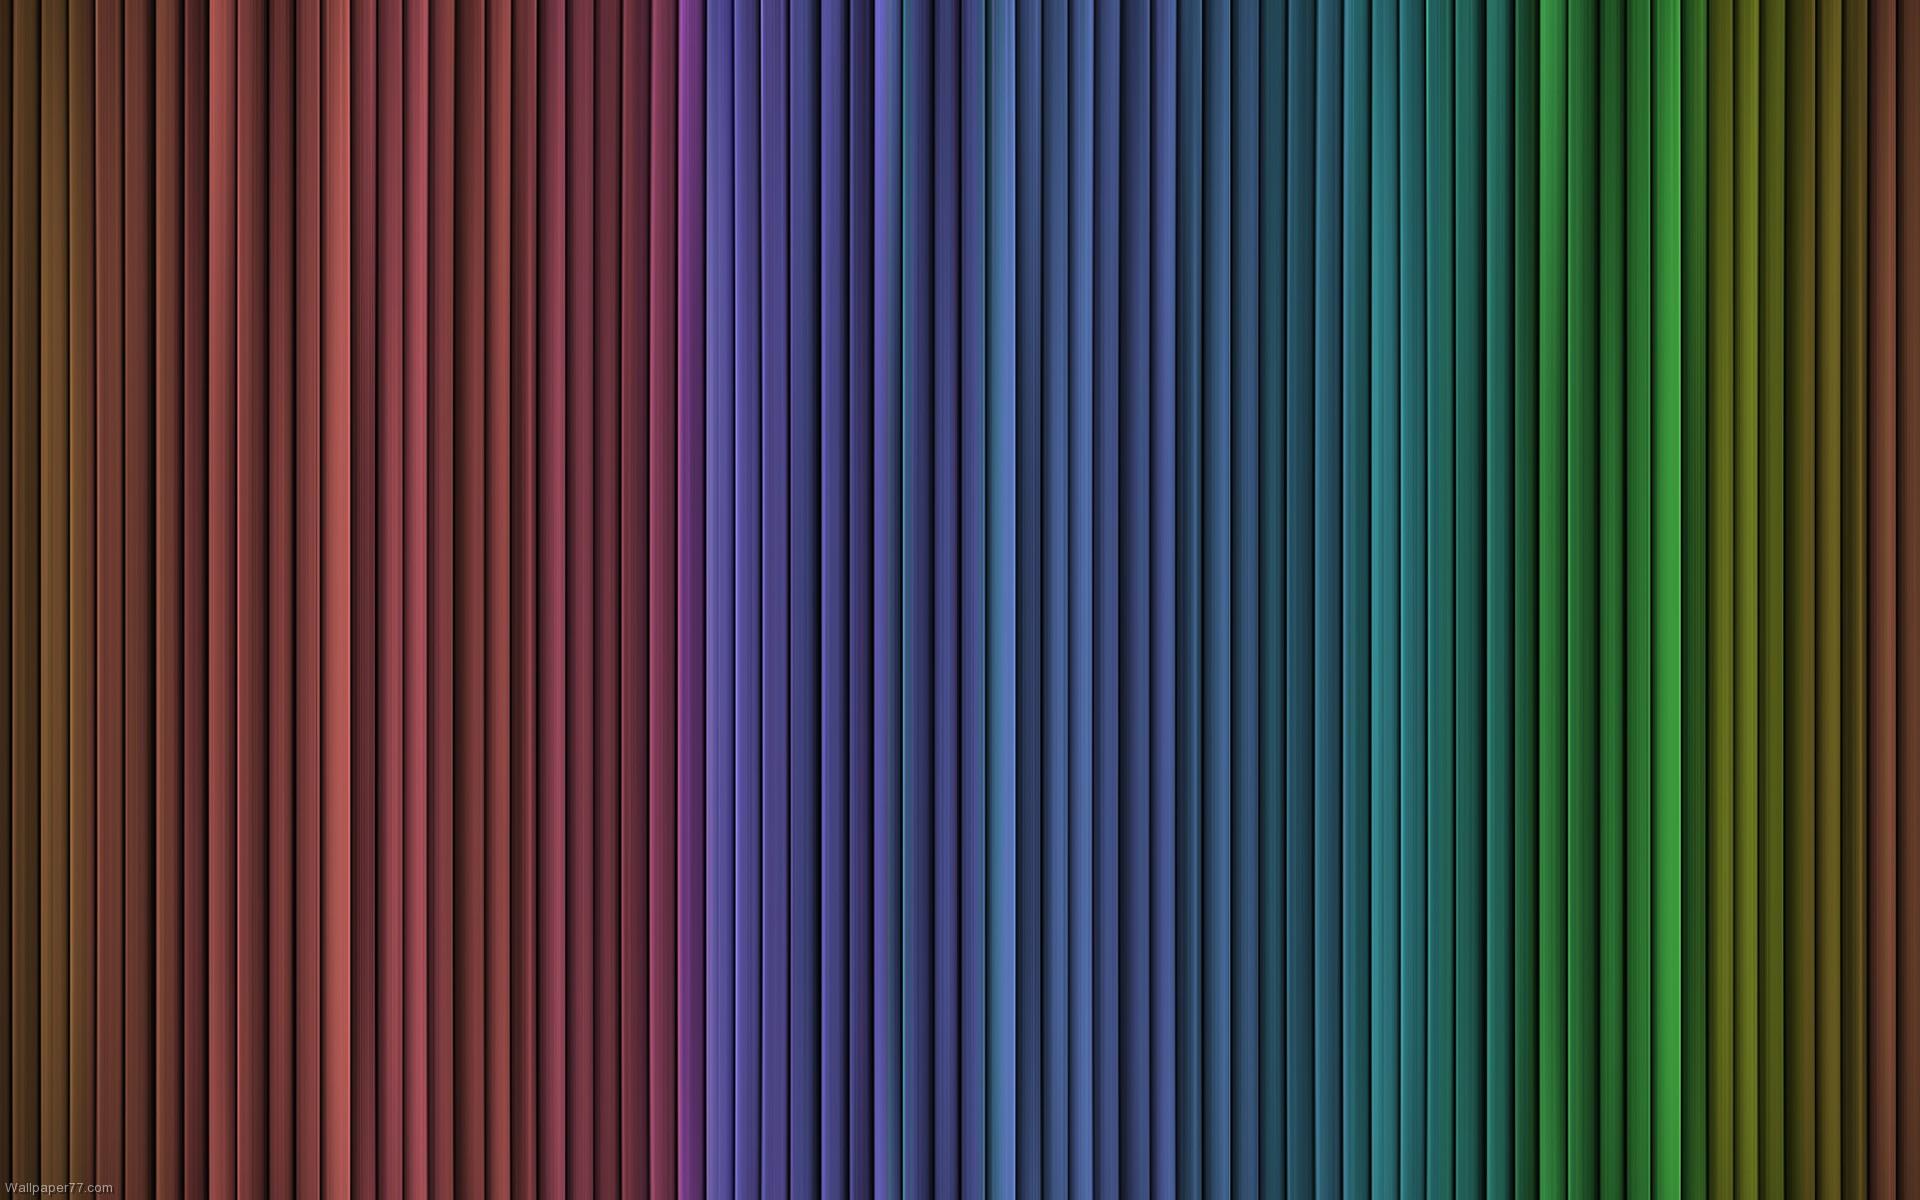 Ipad Retina Wallpaper Art Hand: IPad Retina Display Wallpaper